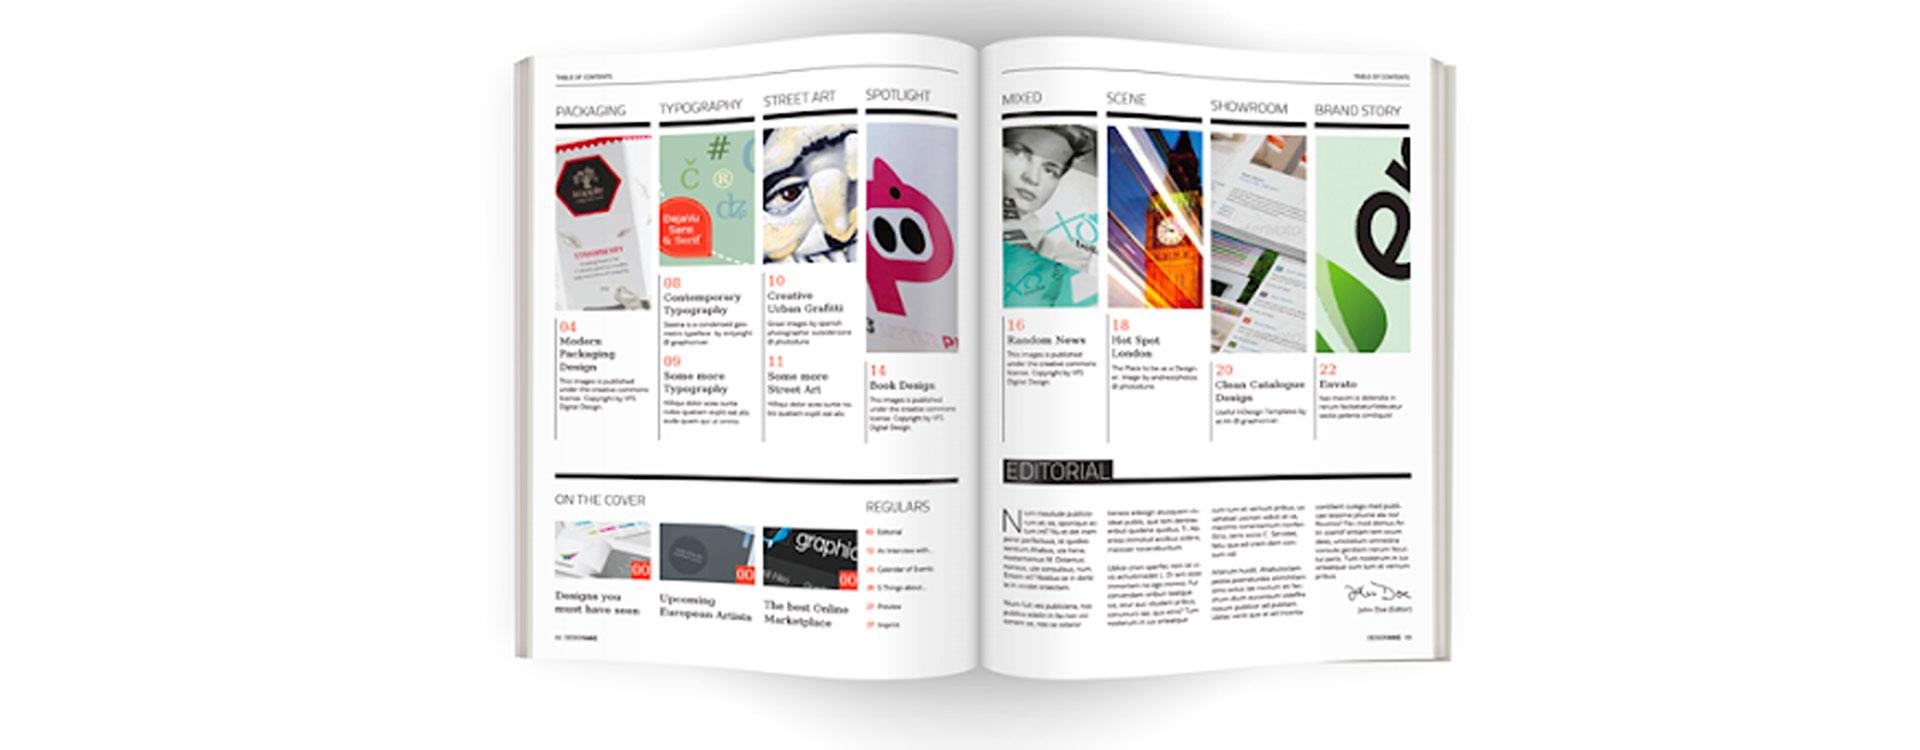 Inhoudsopgave maken in Adobe InDesign